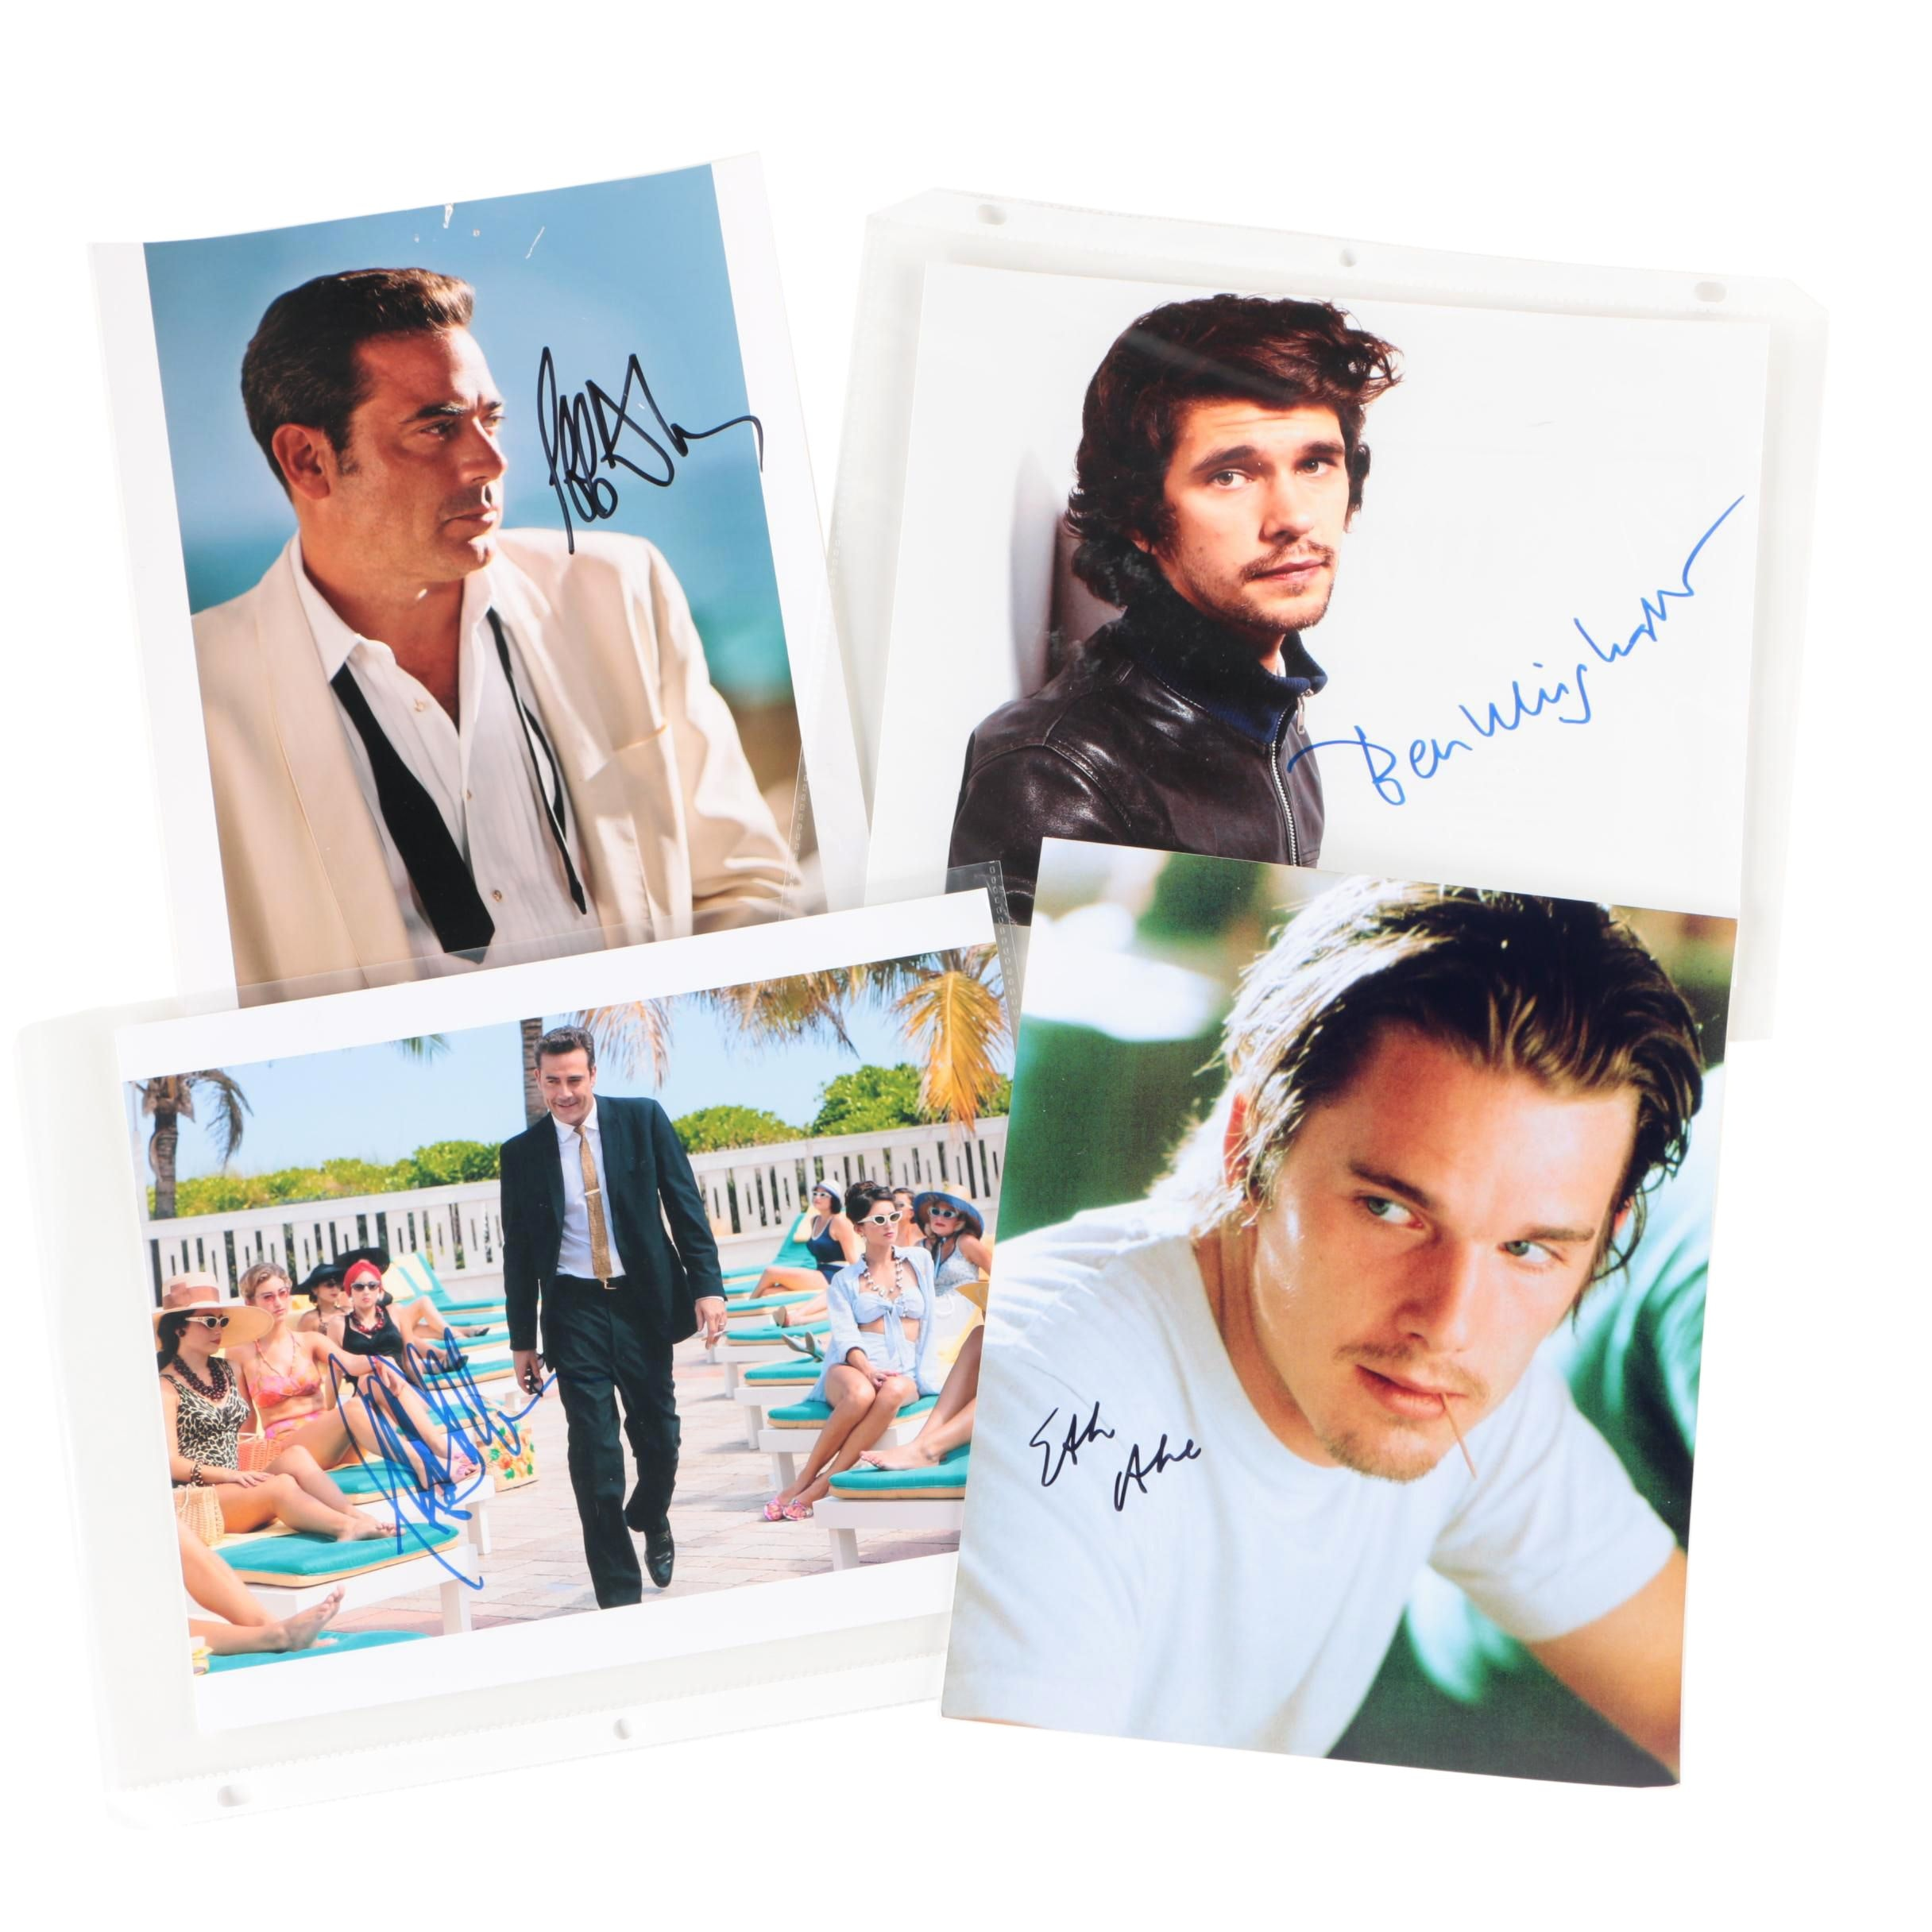 Celebrity Autographs Including Ethan Hawke and Jeffrey Dean Morgan